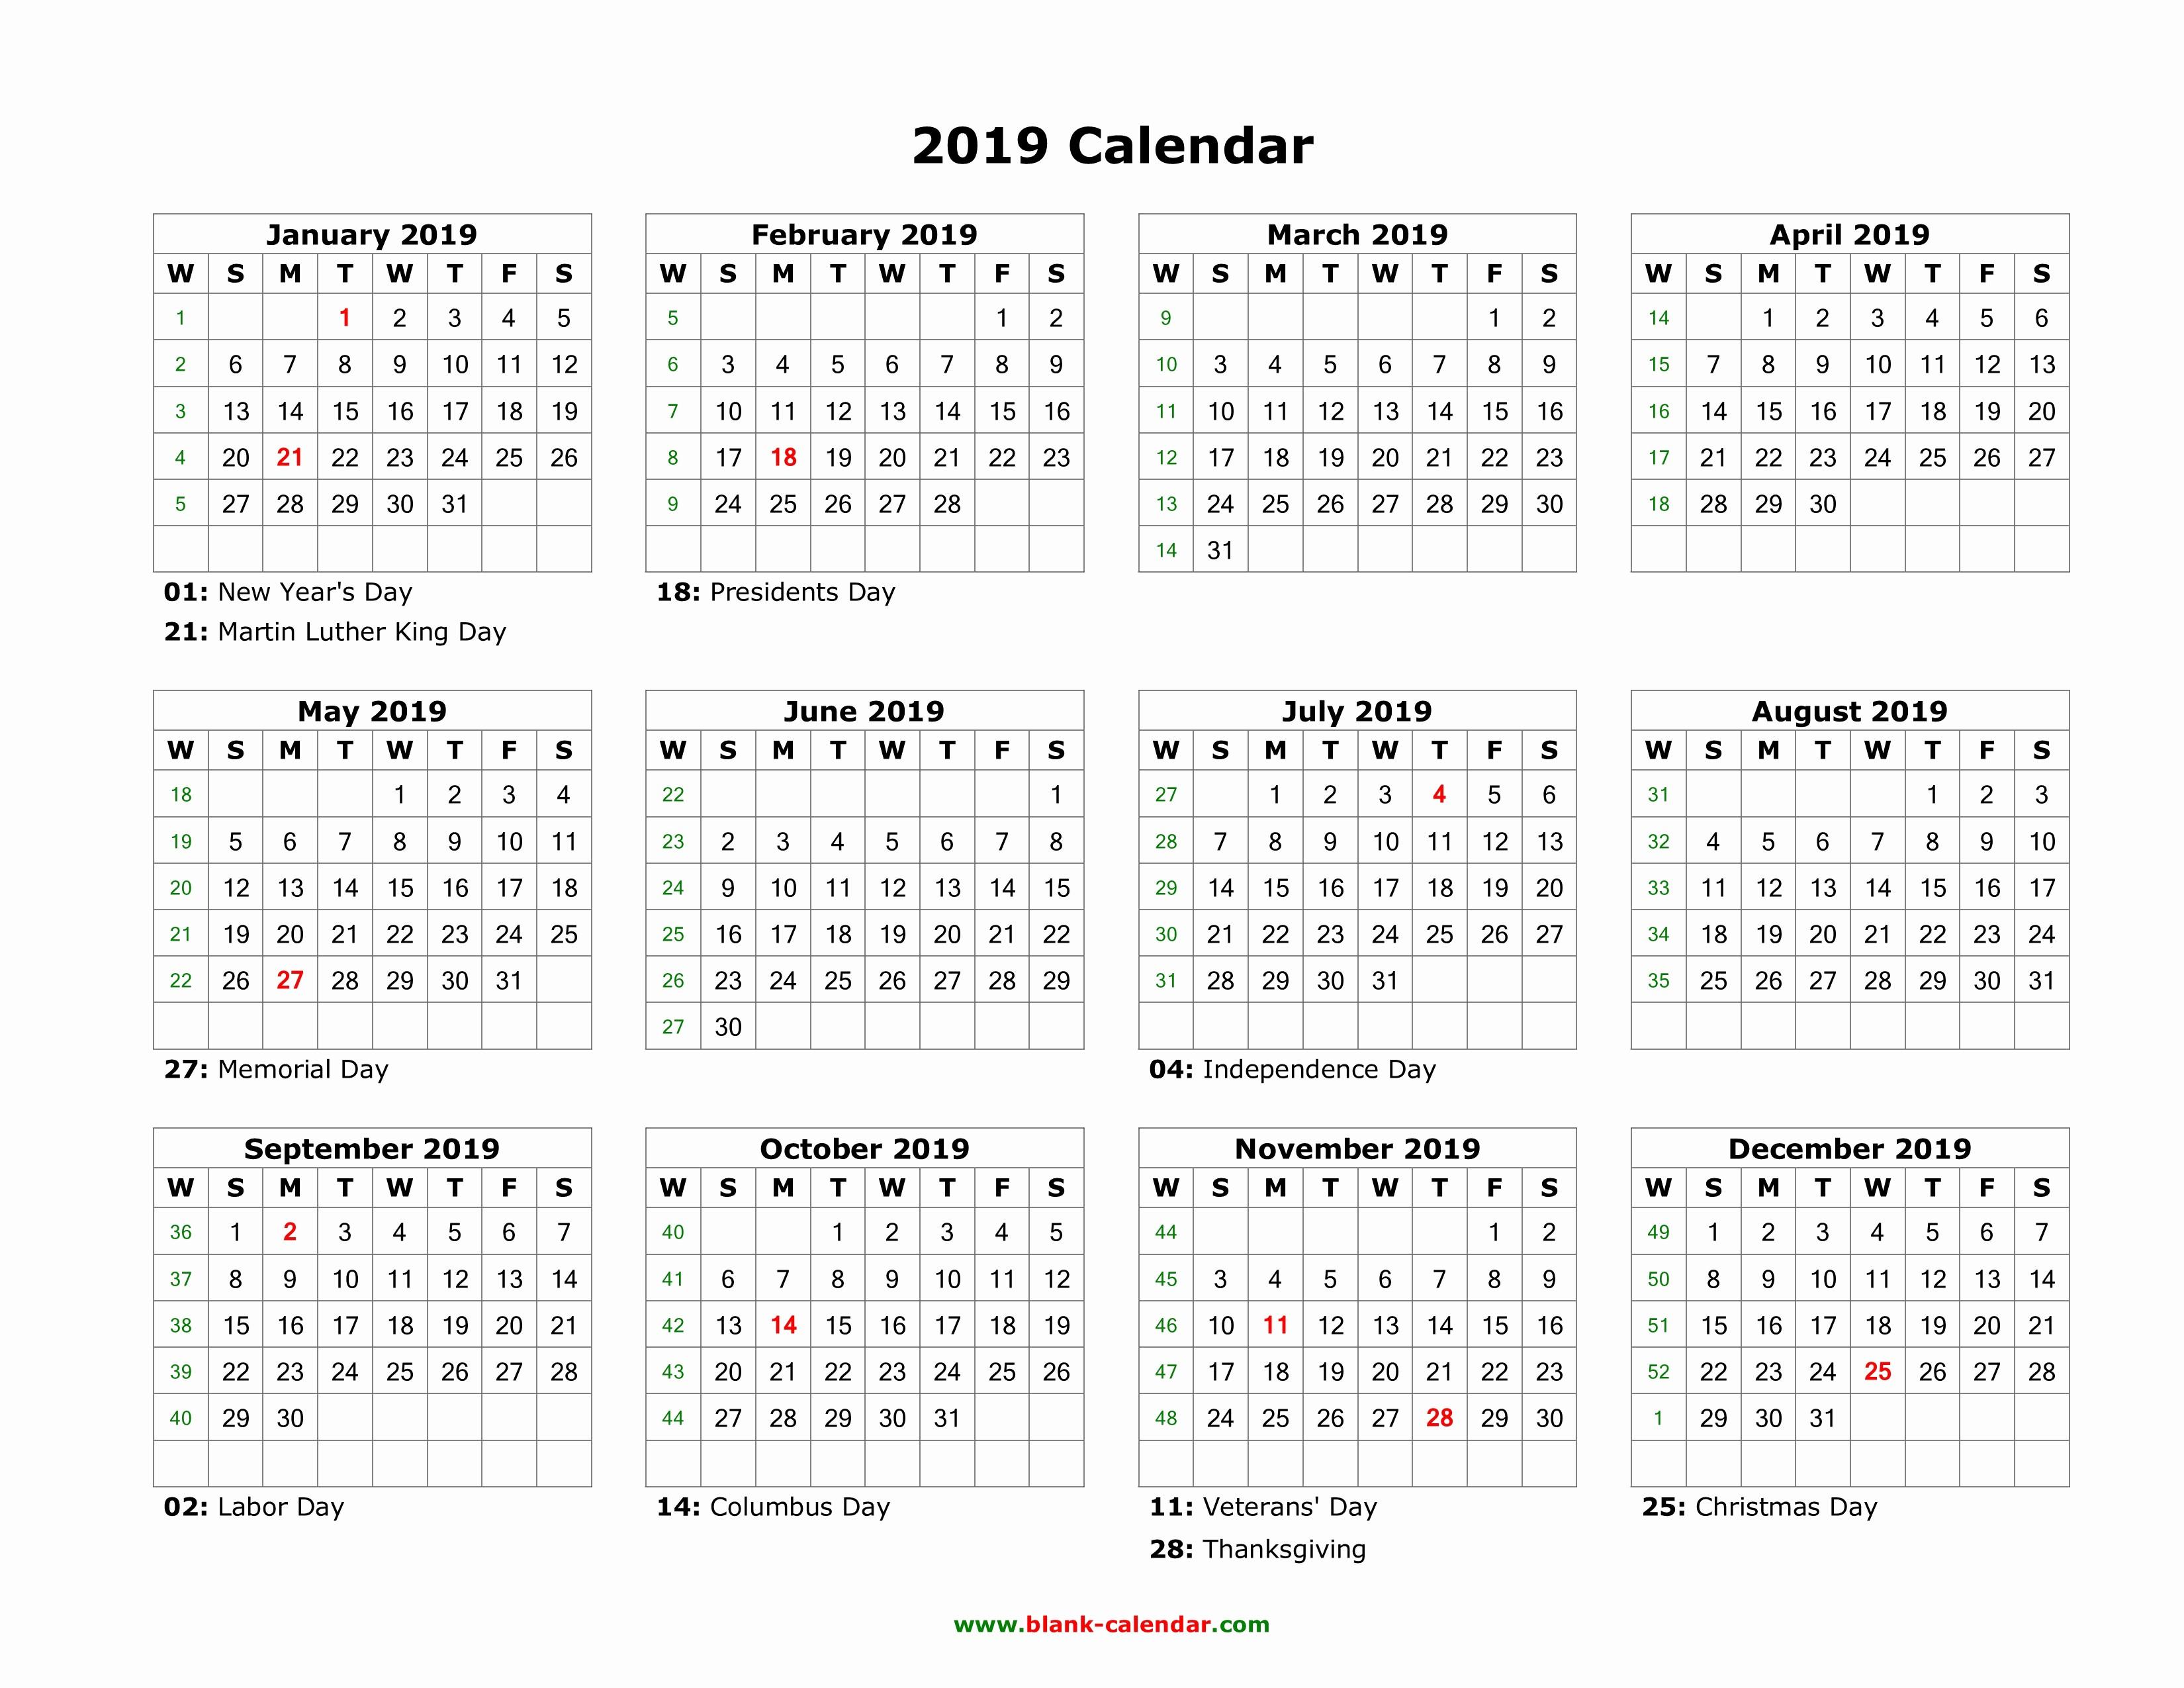 Free Printable Calendar Templates 2019 Best Of Blank Calendar 2019